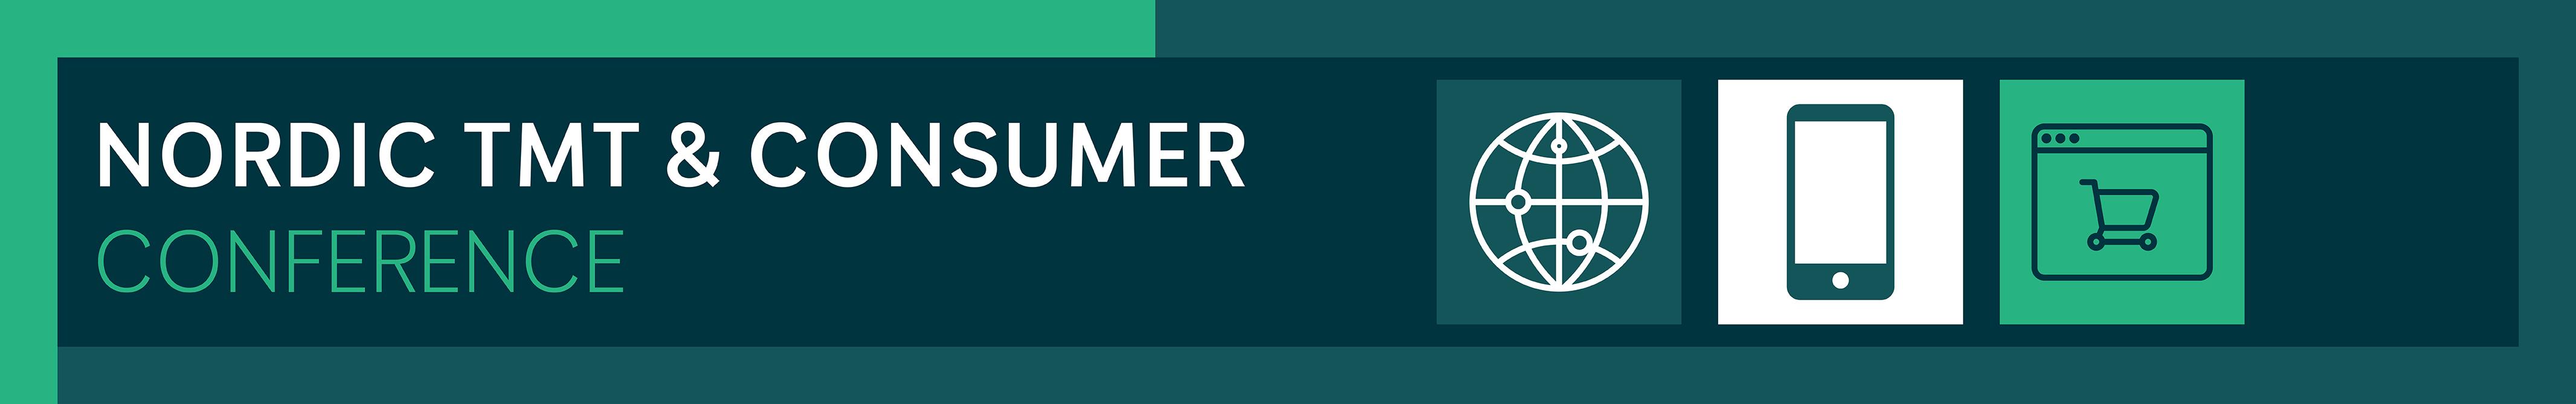 dnb.meetmax.comuploadevent_734834267x670-Nordic-TMT-And-Consumer-Conference-1